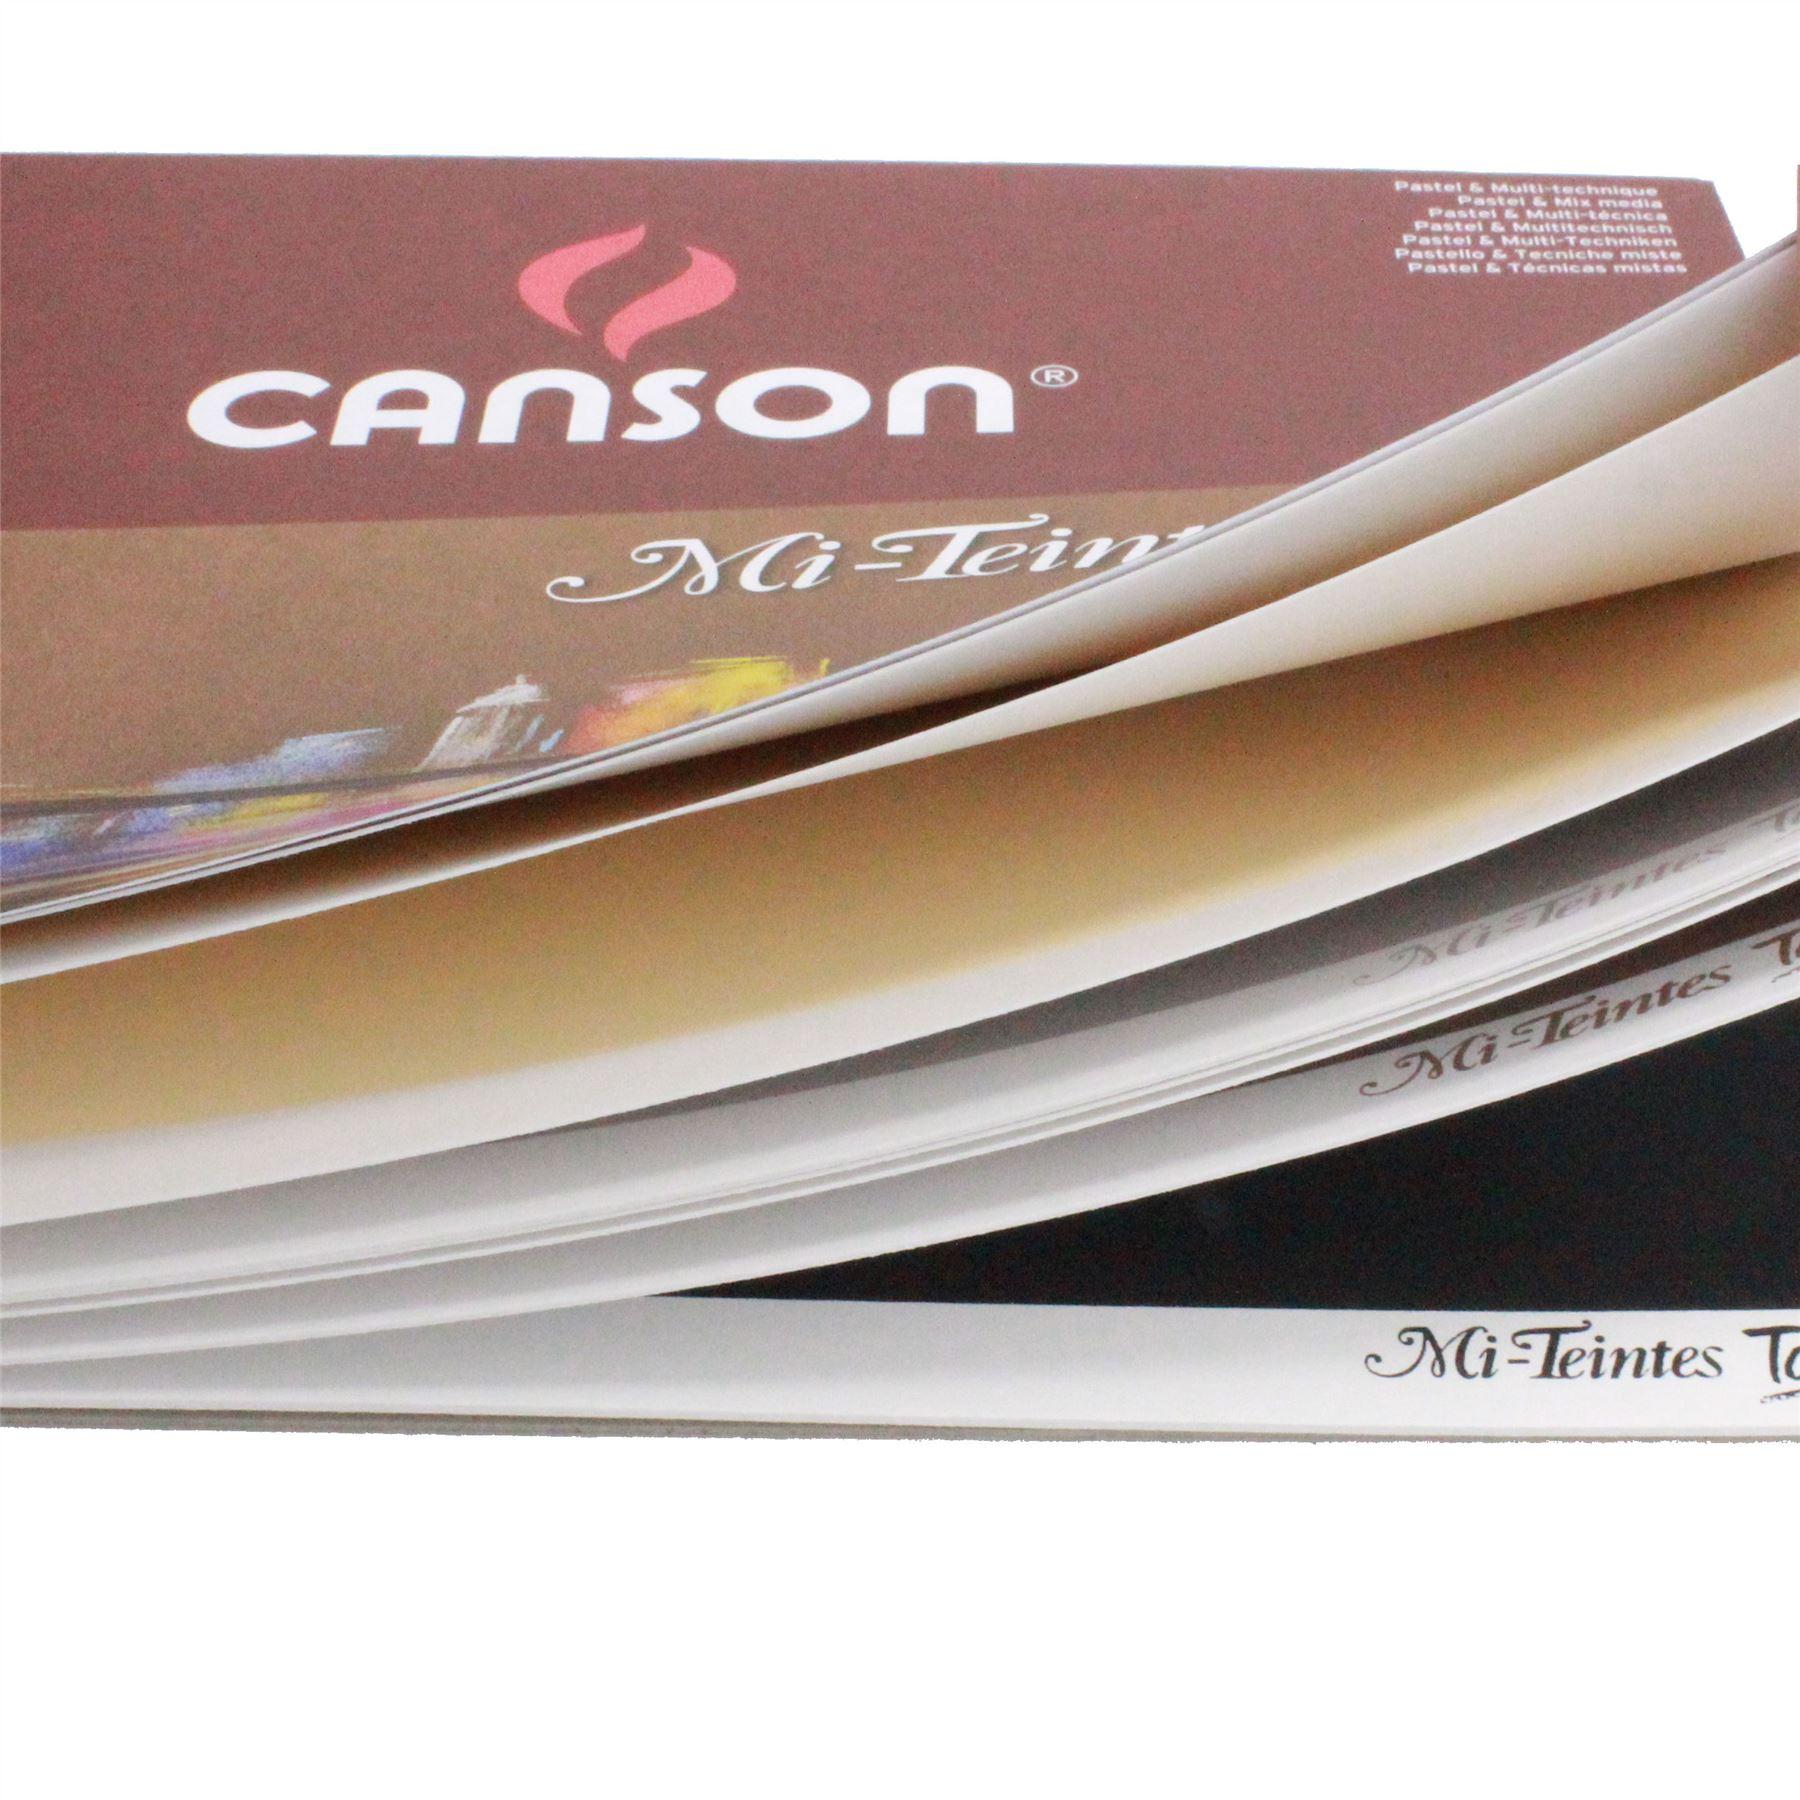 sand-paper-texture-pastel-paper-canson-Mi-Teintes-touch-soft-pastel-pad thumbnail 5